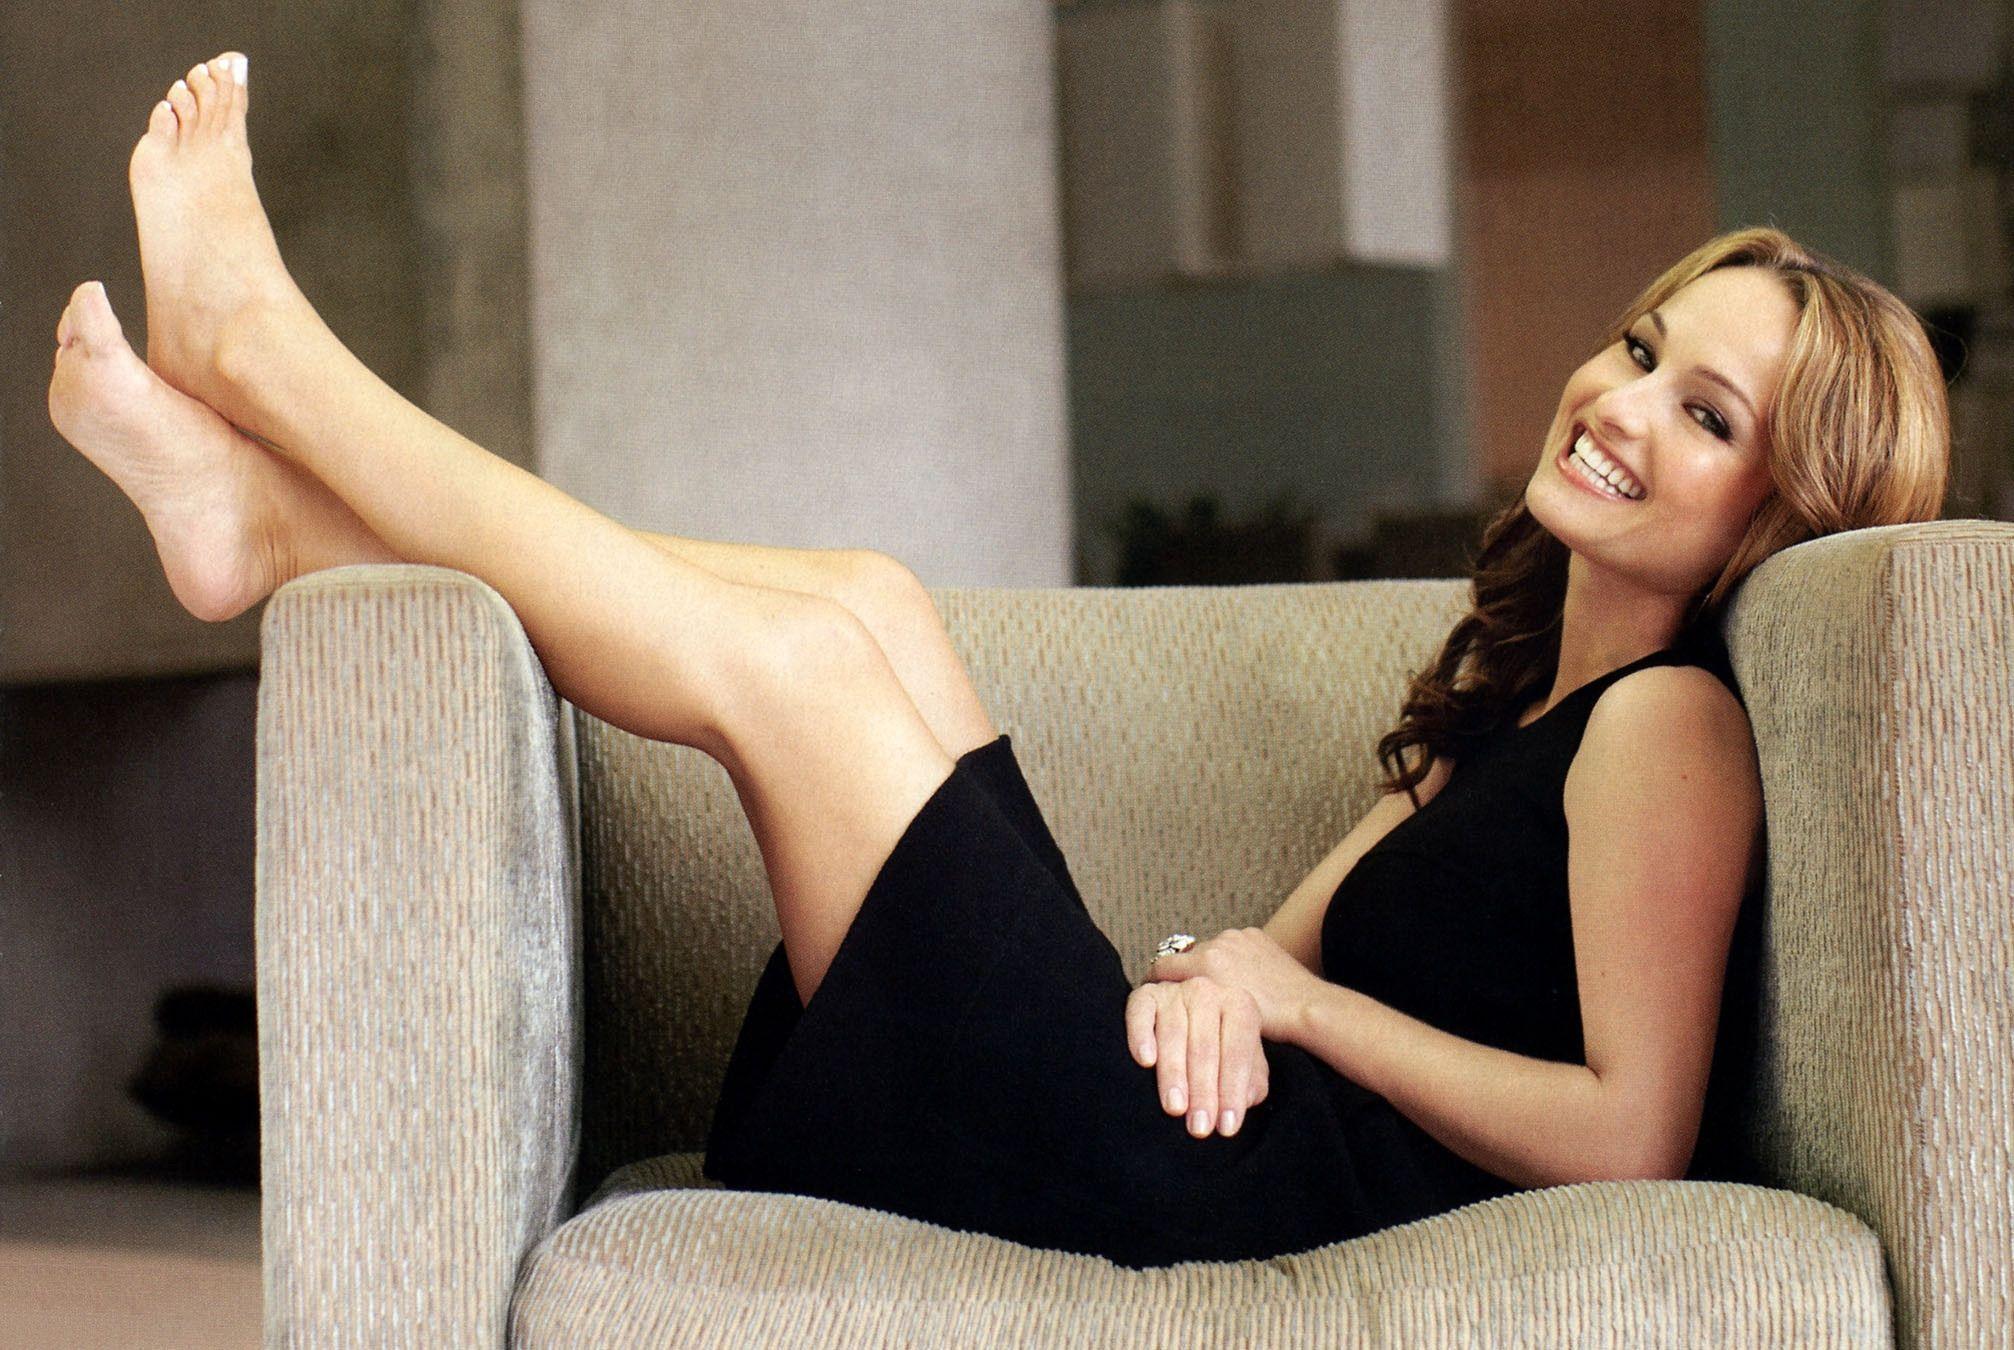 Italian Hotties Delightful giada de laurentiis | pretty feet | pinterest | giada de